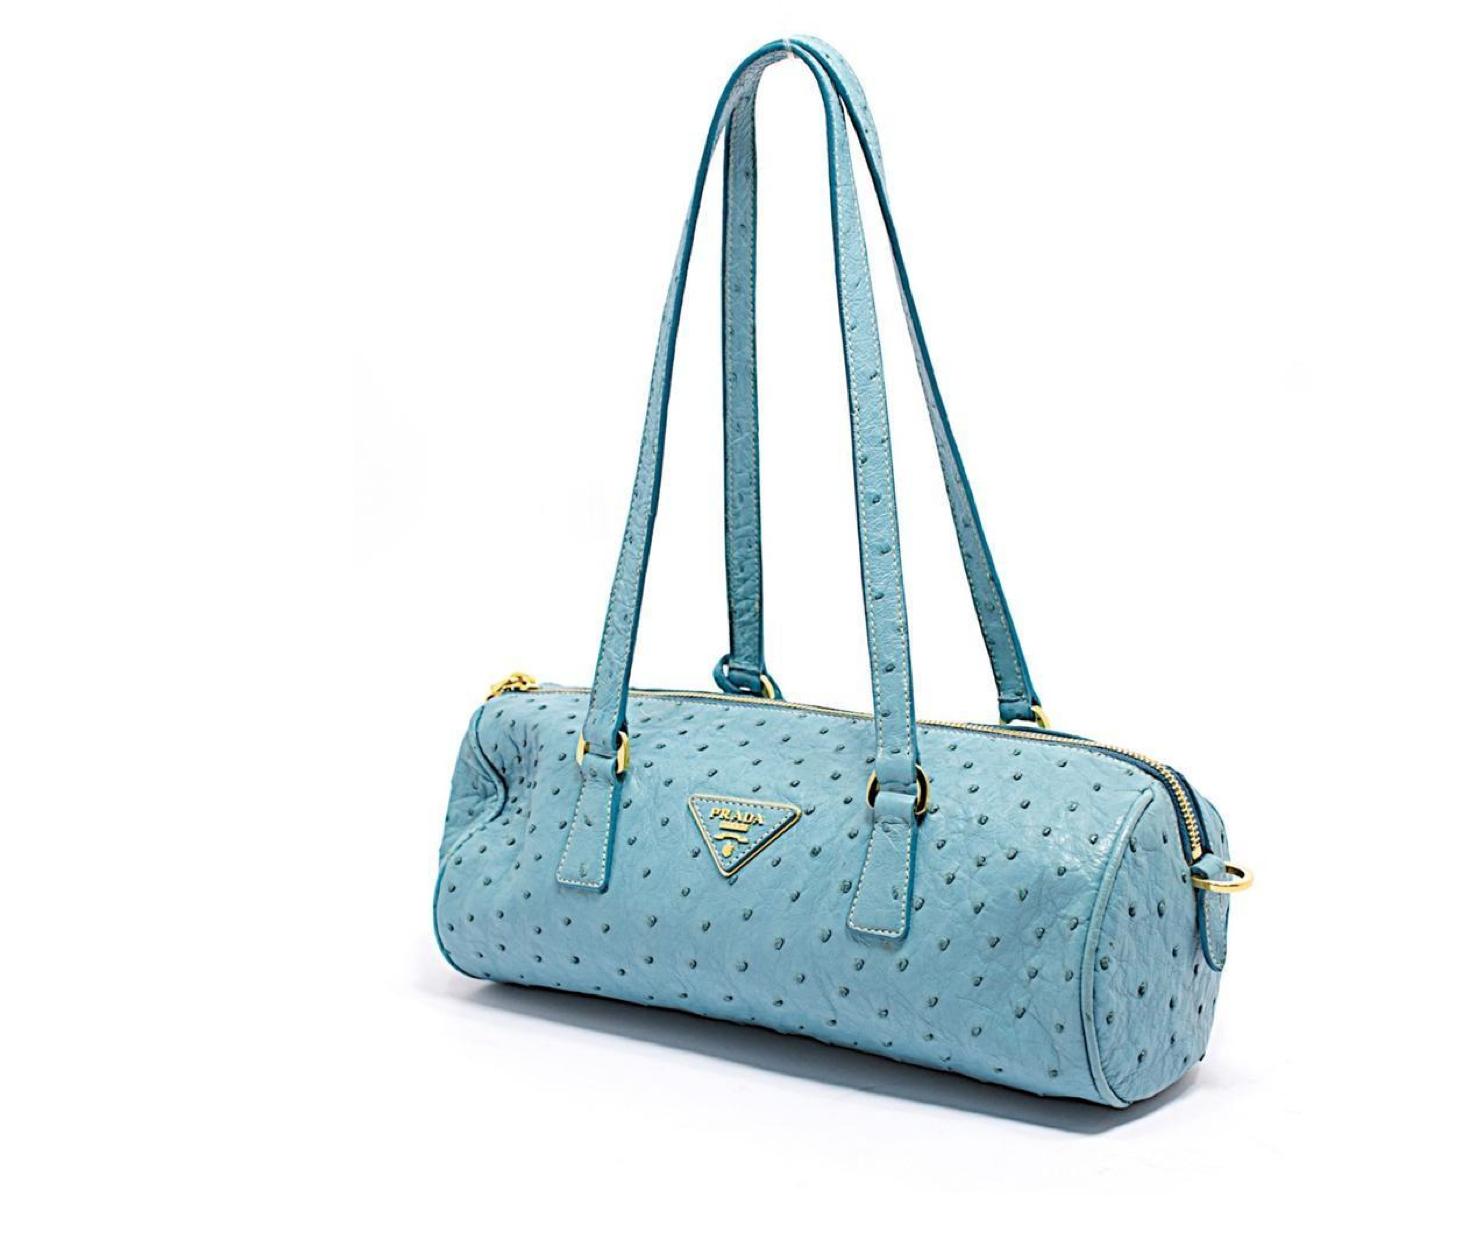 black and white prada handbag - Uncategorized | Find your perfect PRADA